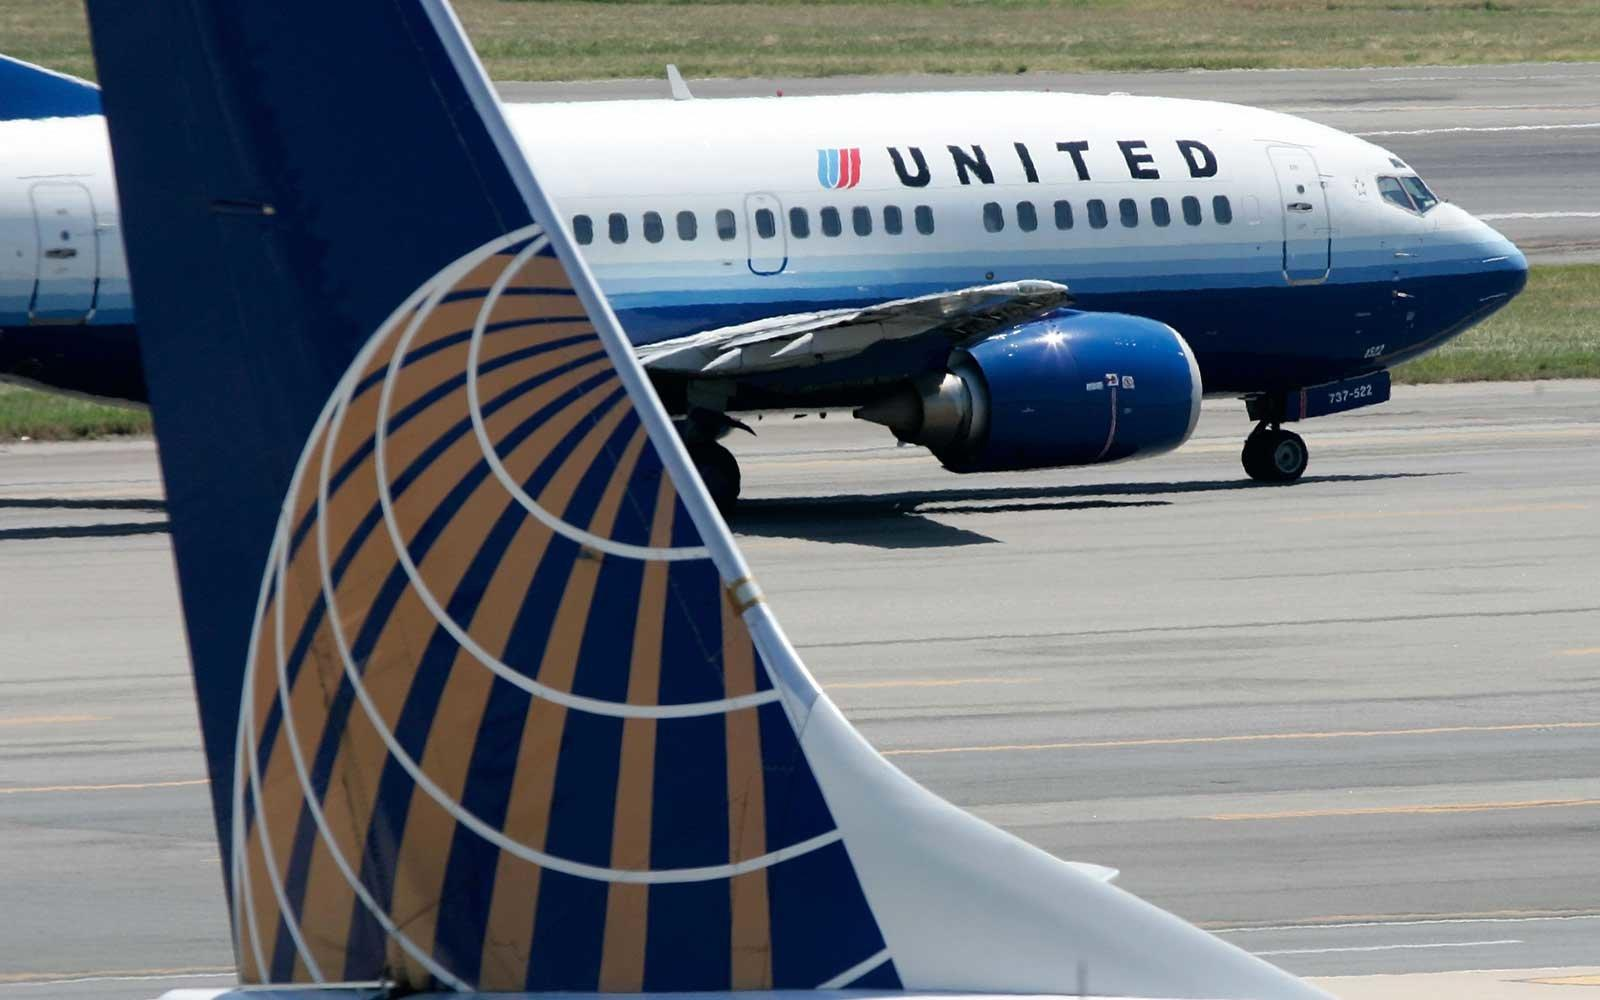 ua39 united airlines